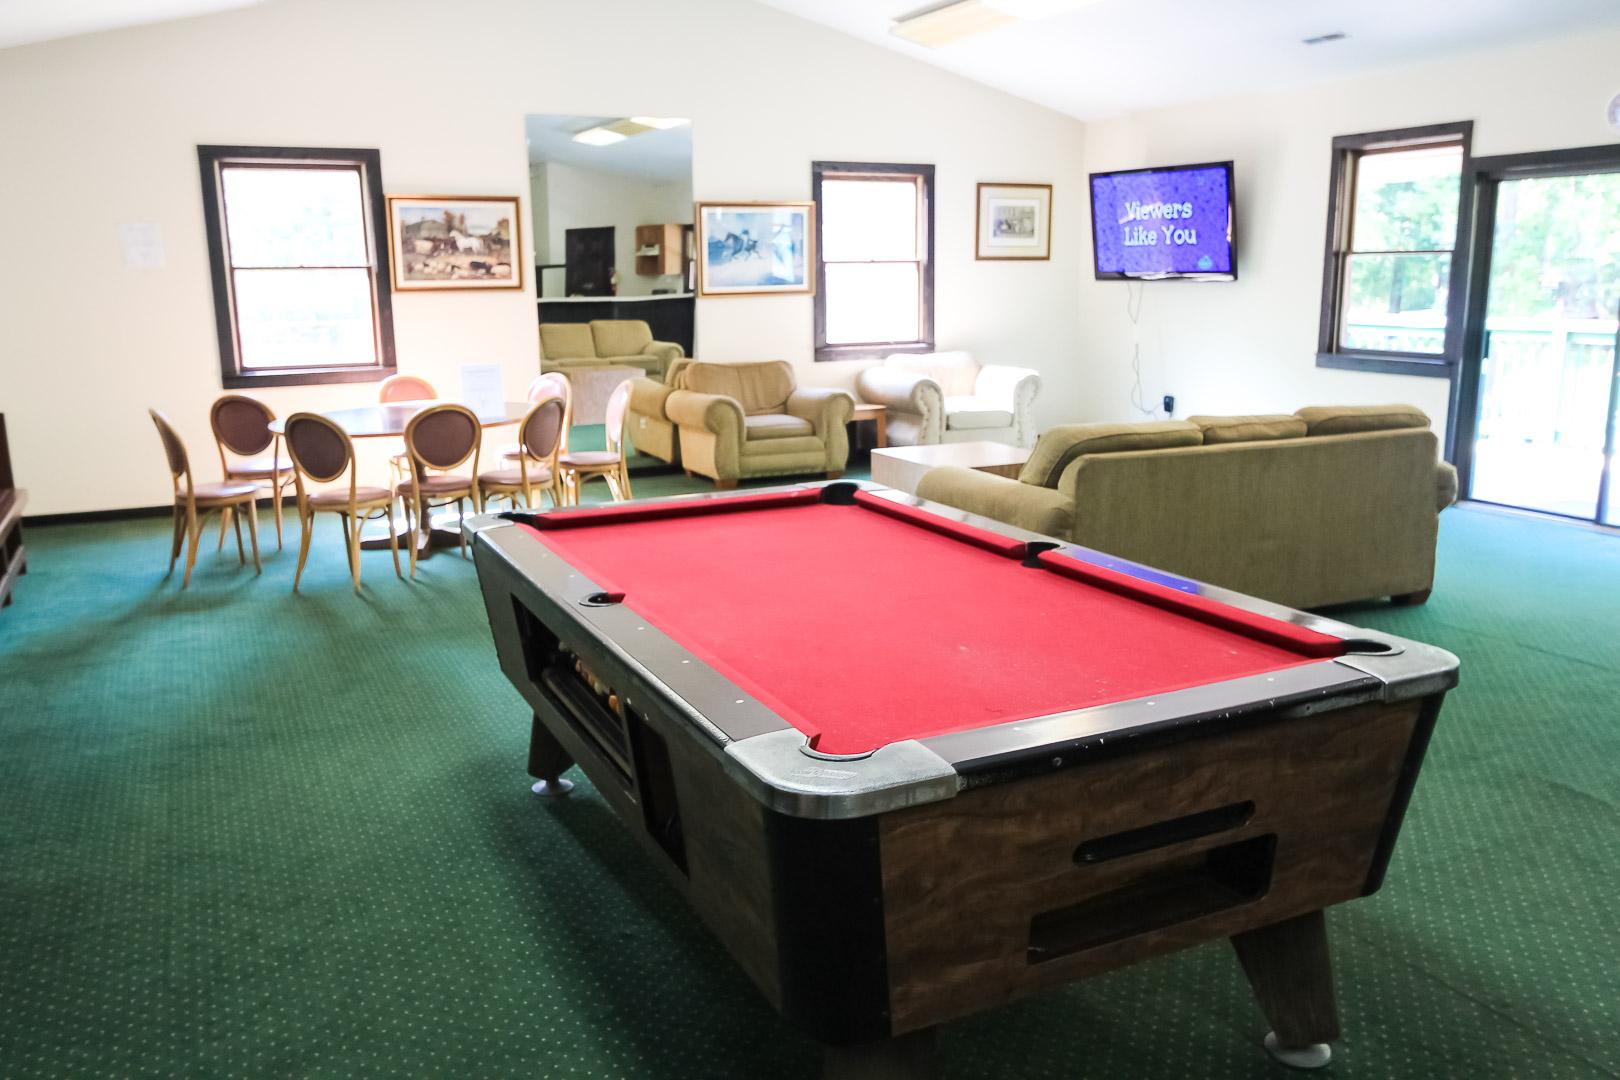 A Game room at VRI's Alpine Crest Resort in Georgia.